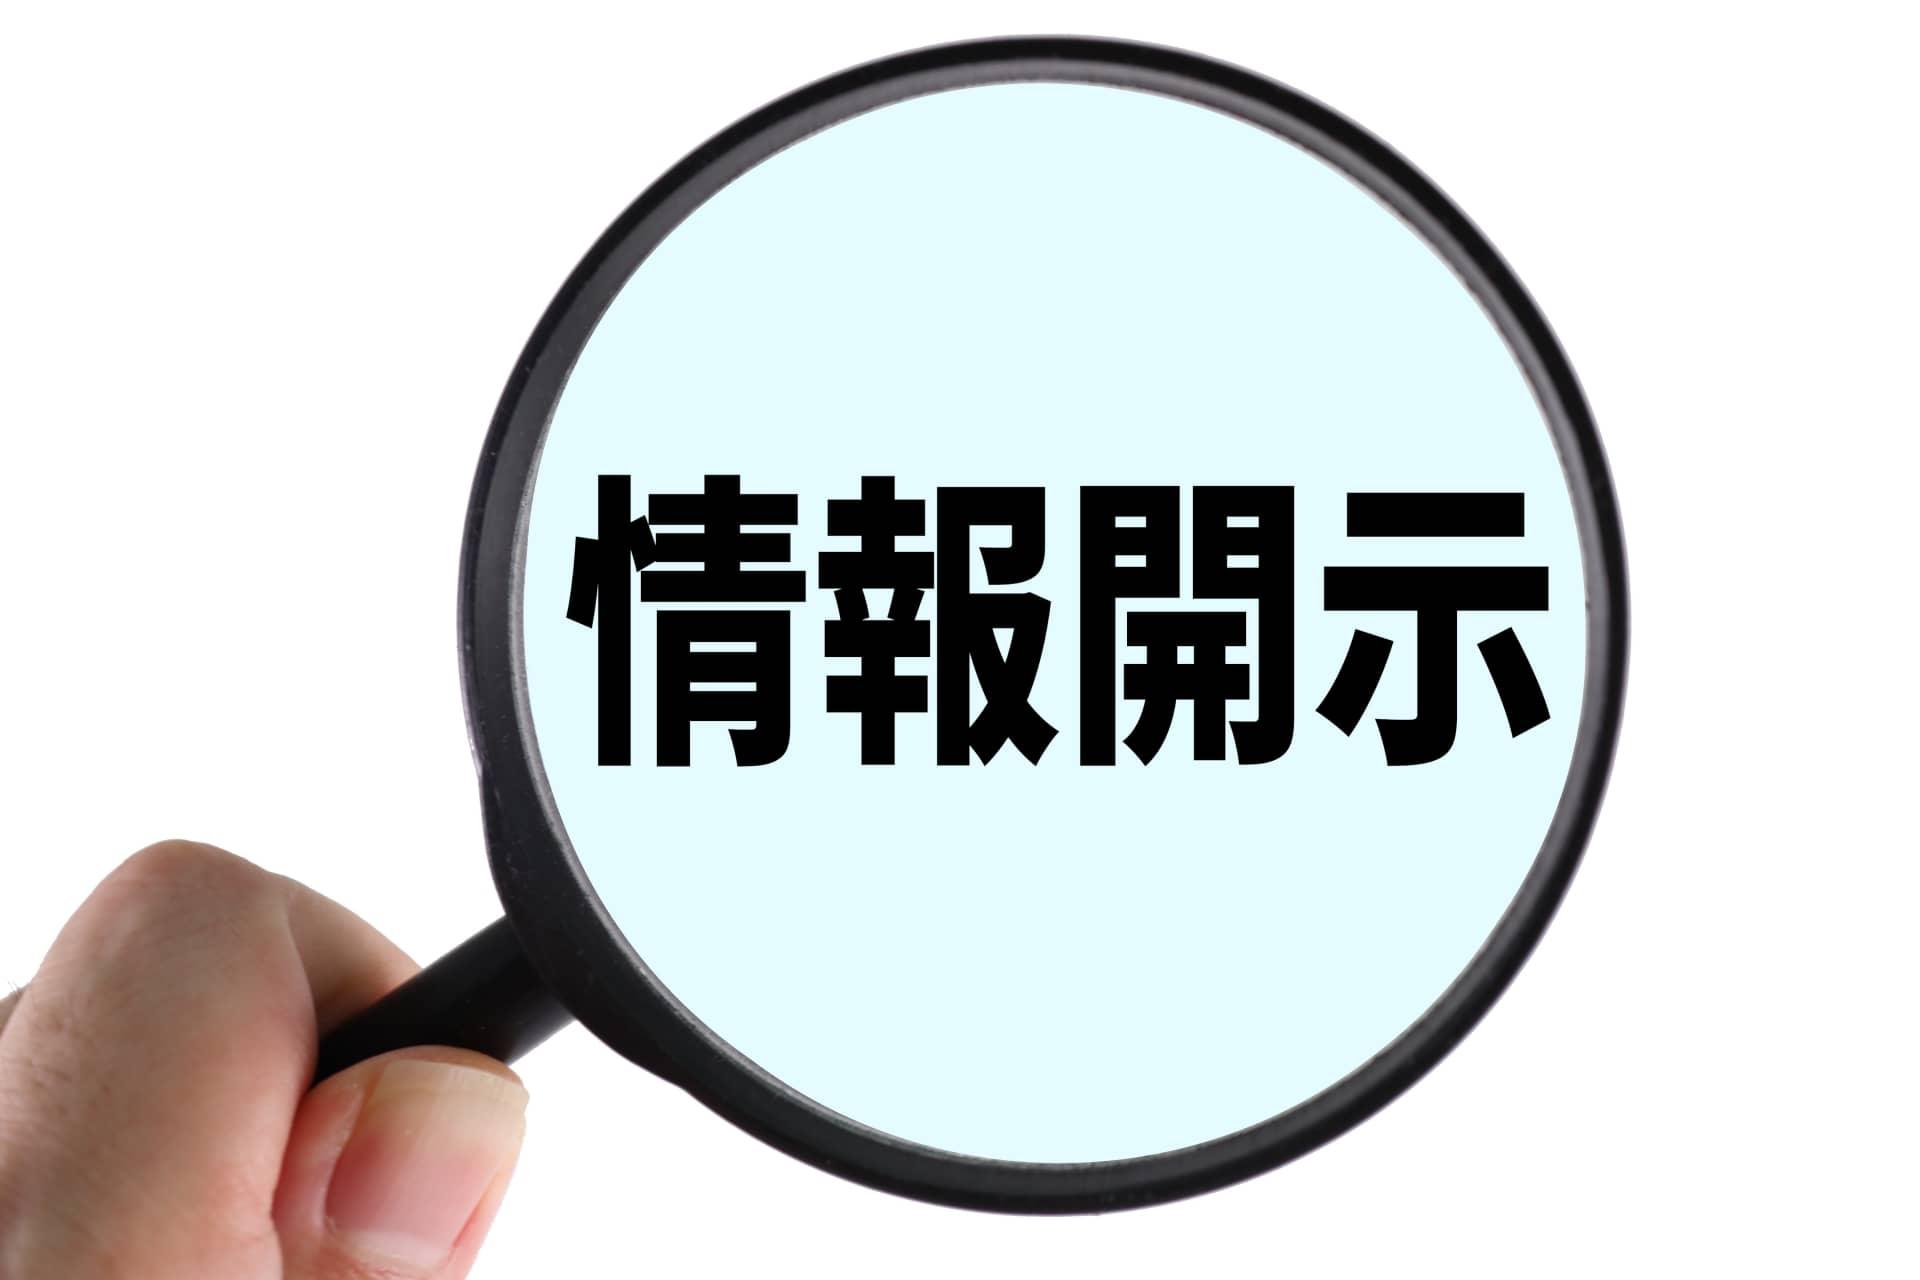 EC-CUBE脆弱性情報の公開の是非